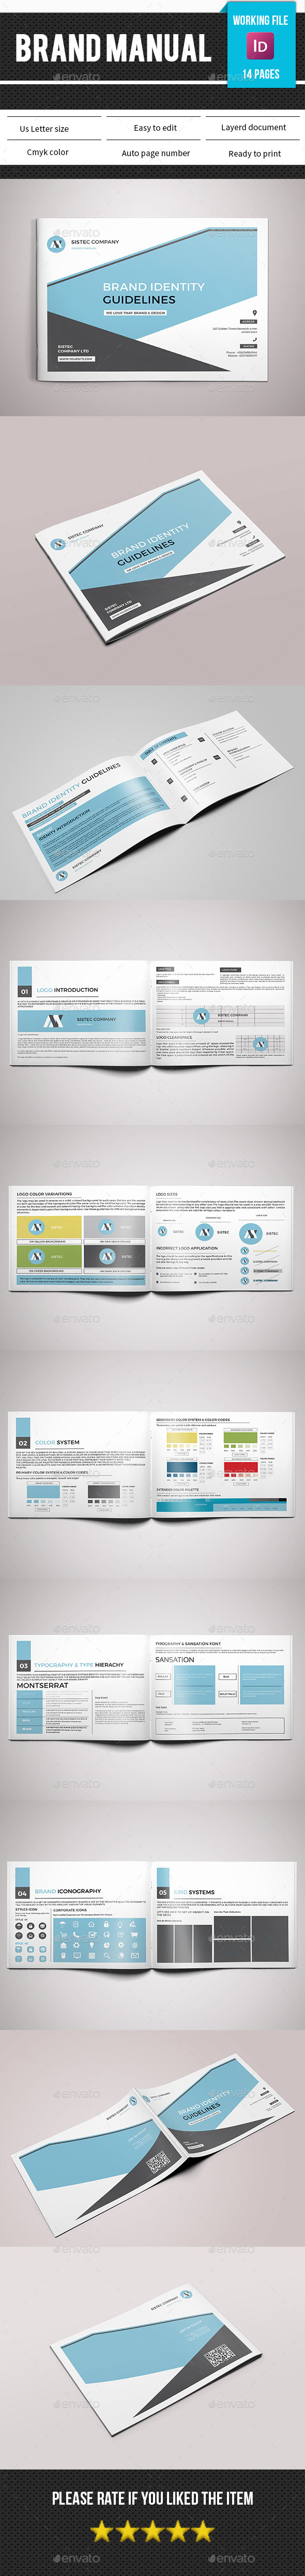 Brand Manual Template-V04 - Informational Brochures